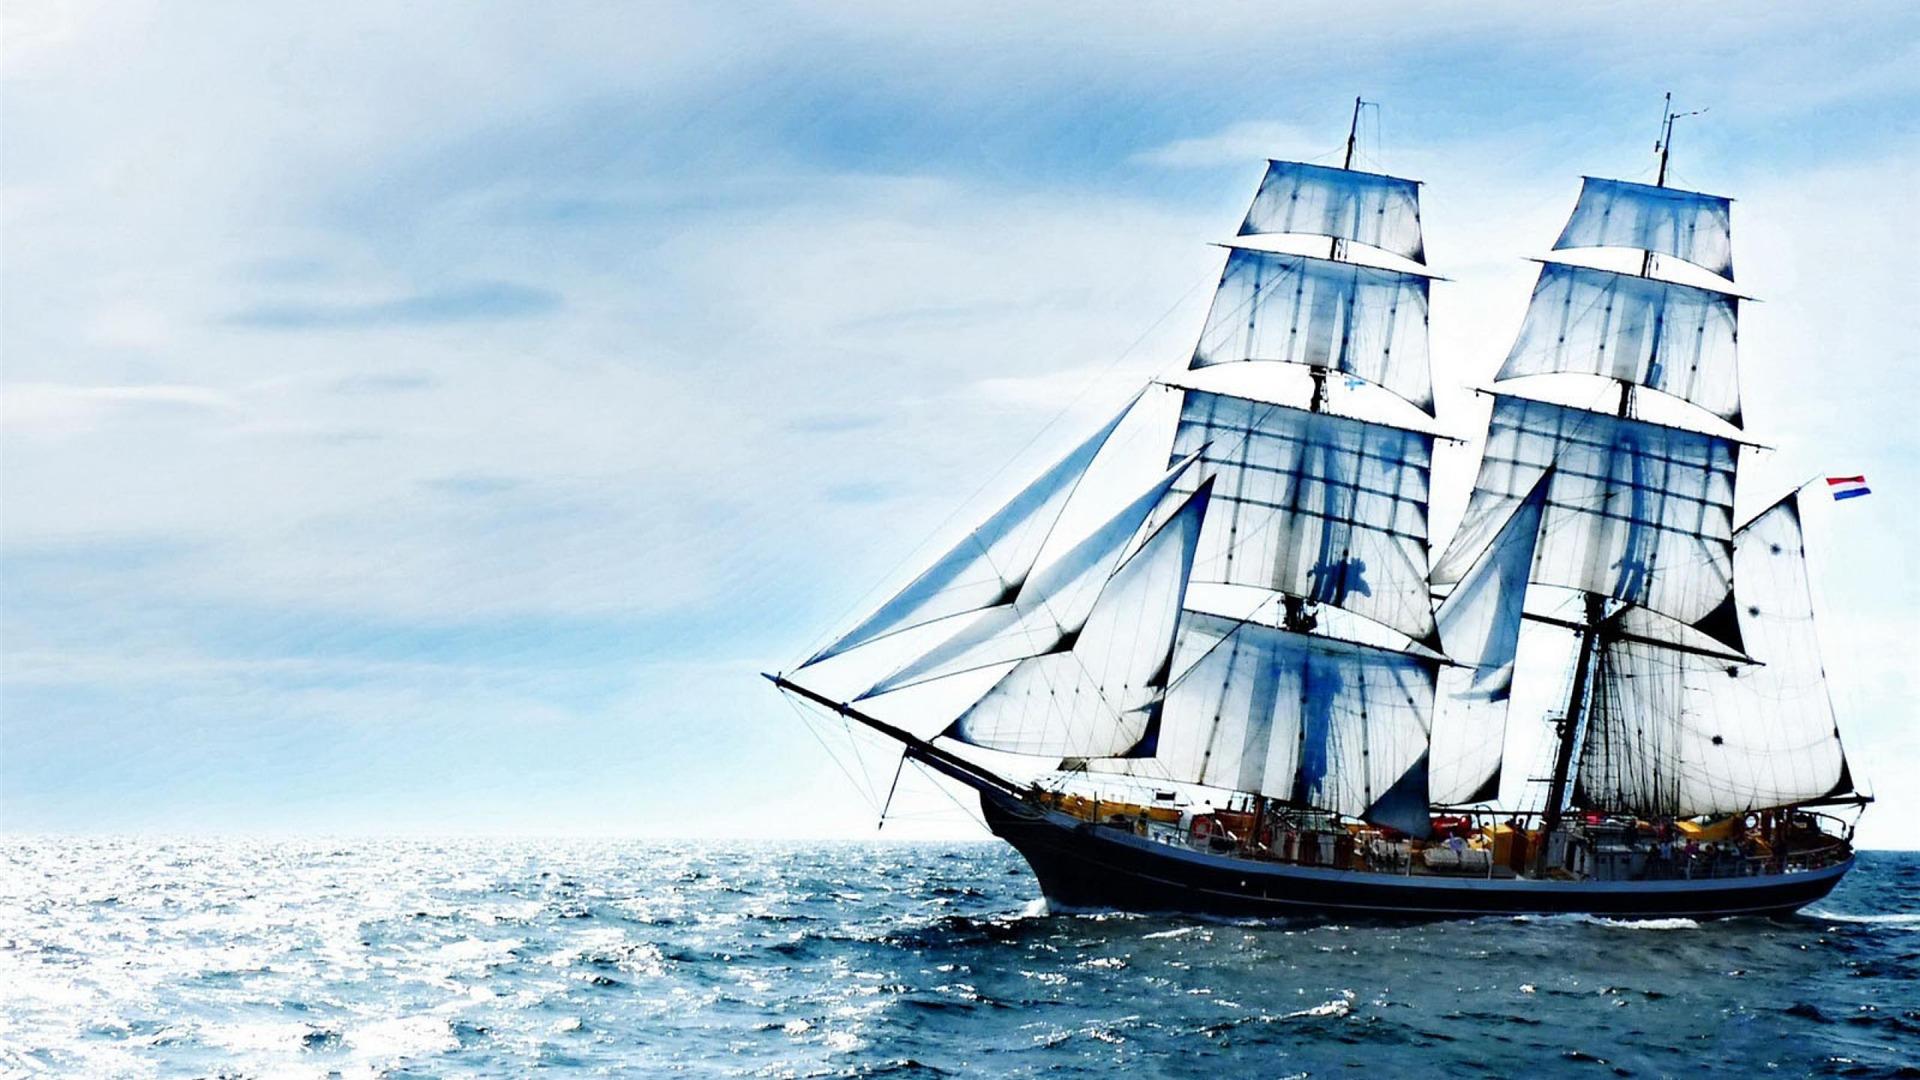 Voilier Oceanique Fond D Ecran Theme De Navire Apercu 10wallpaper Com